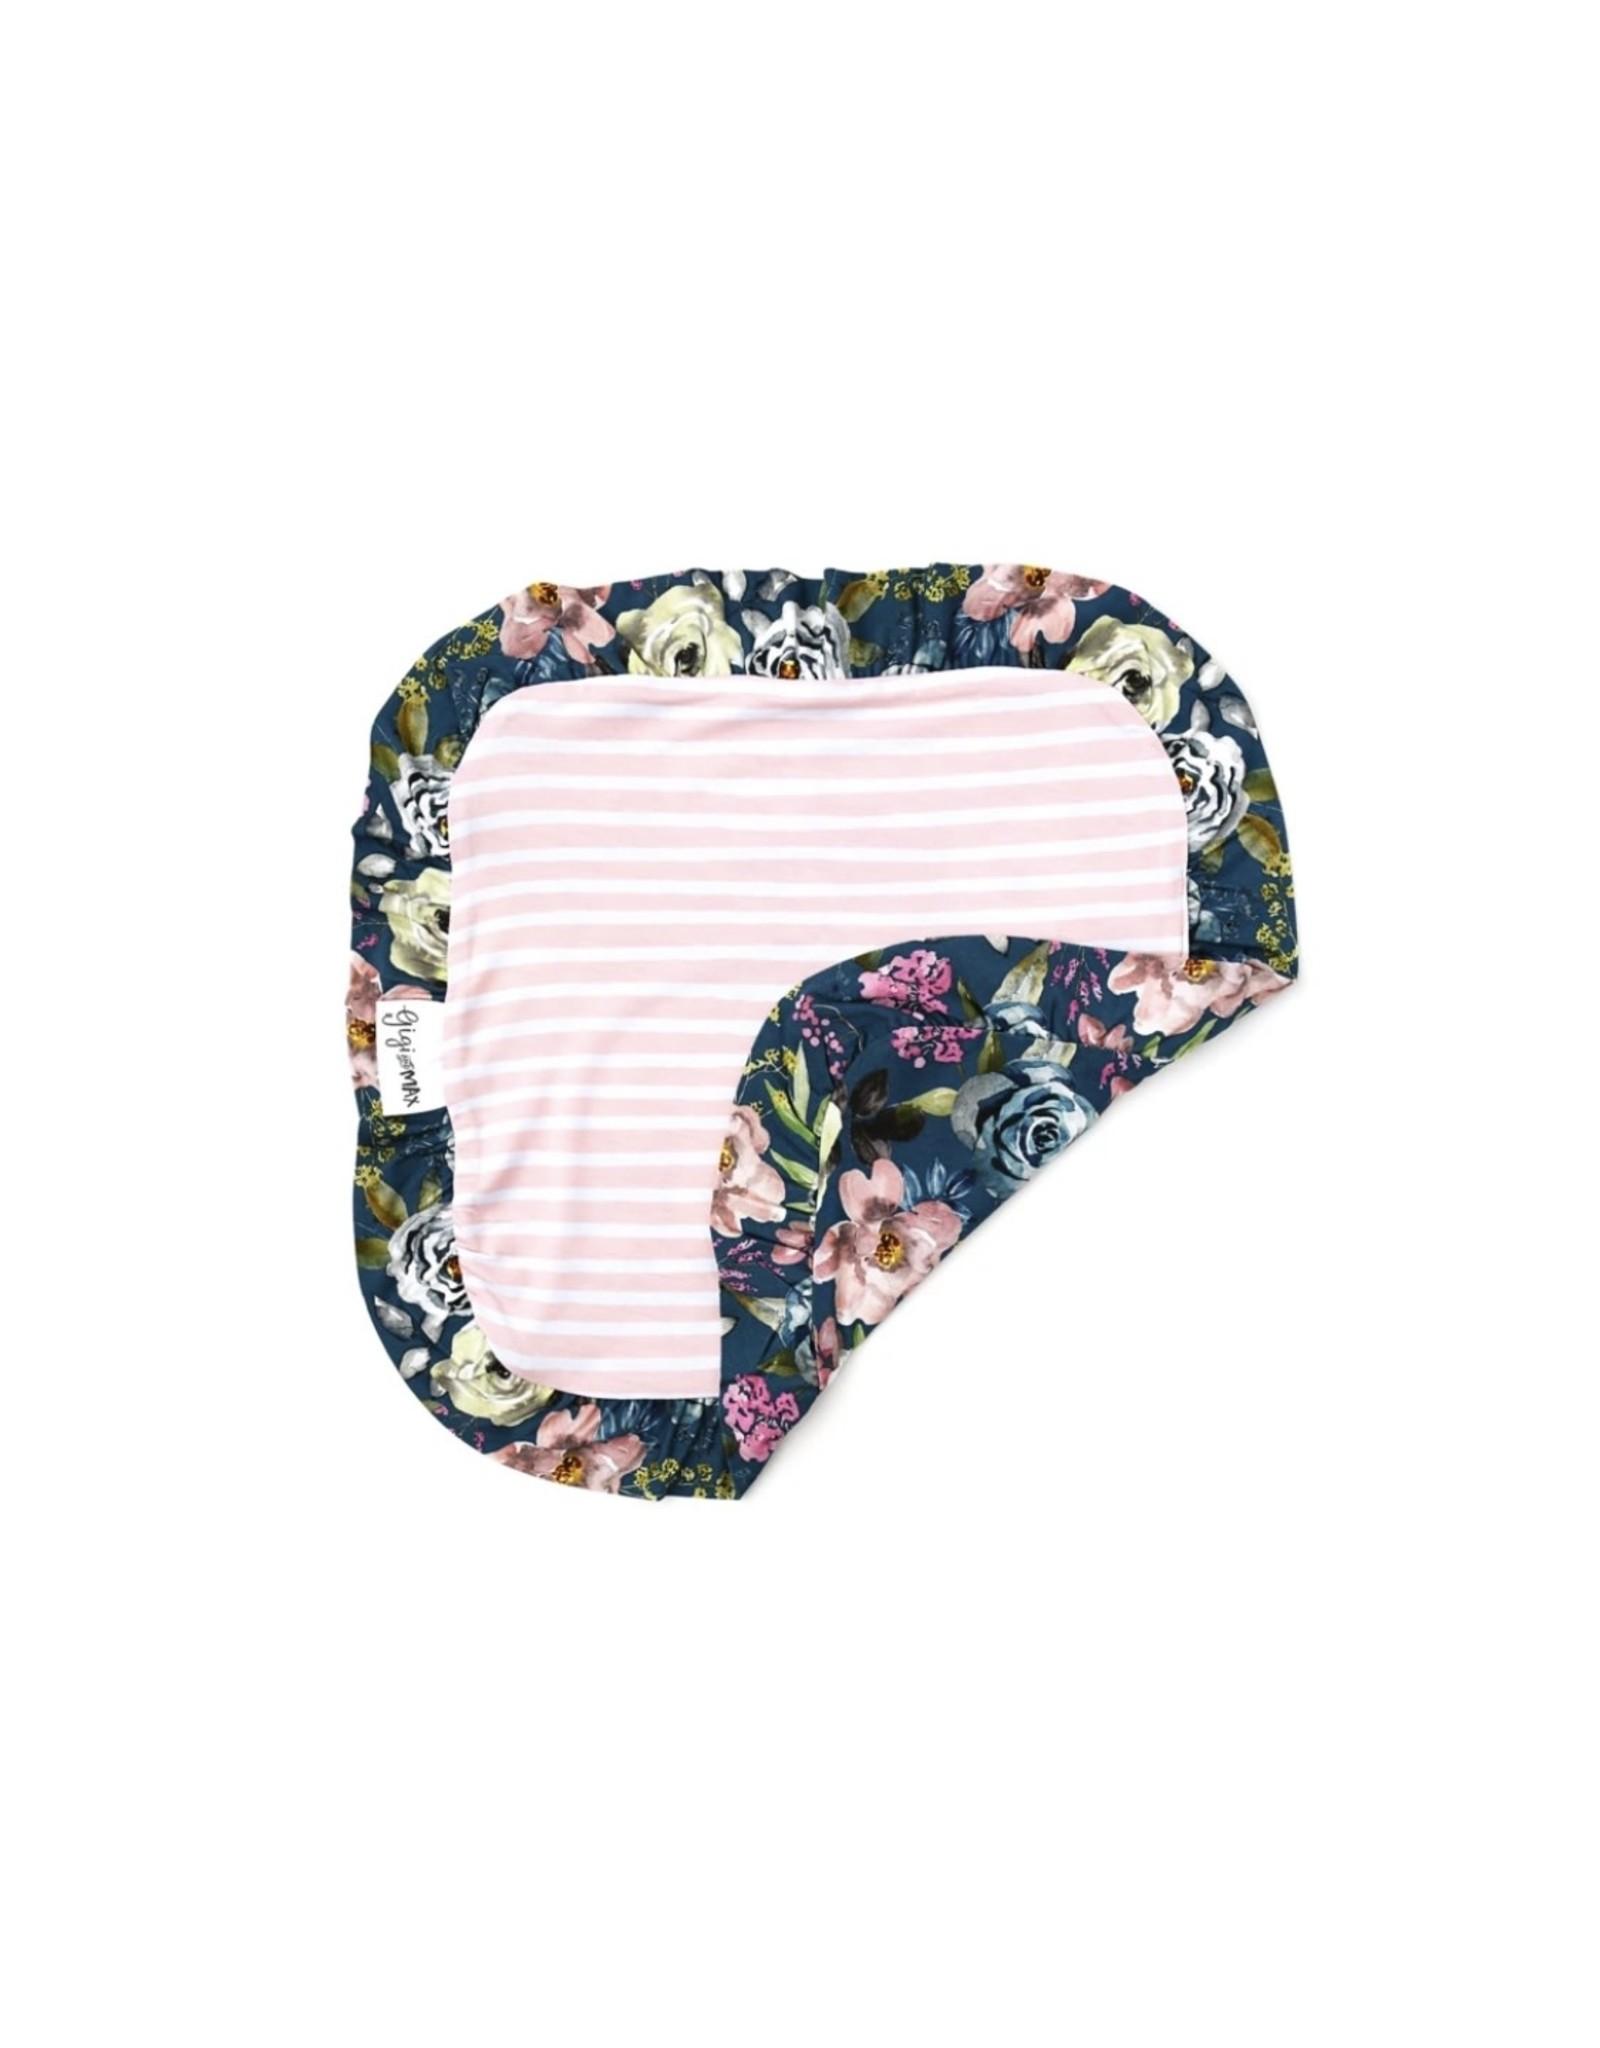 Gigi & Max Gigi & Max- Laken Floral Ruffle Lovey